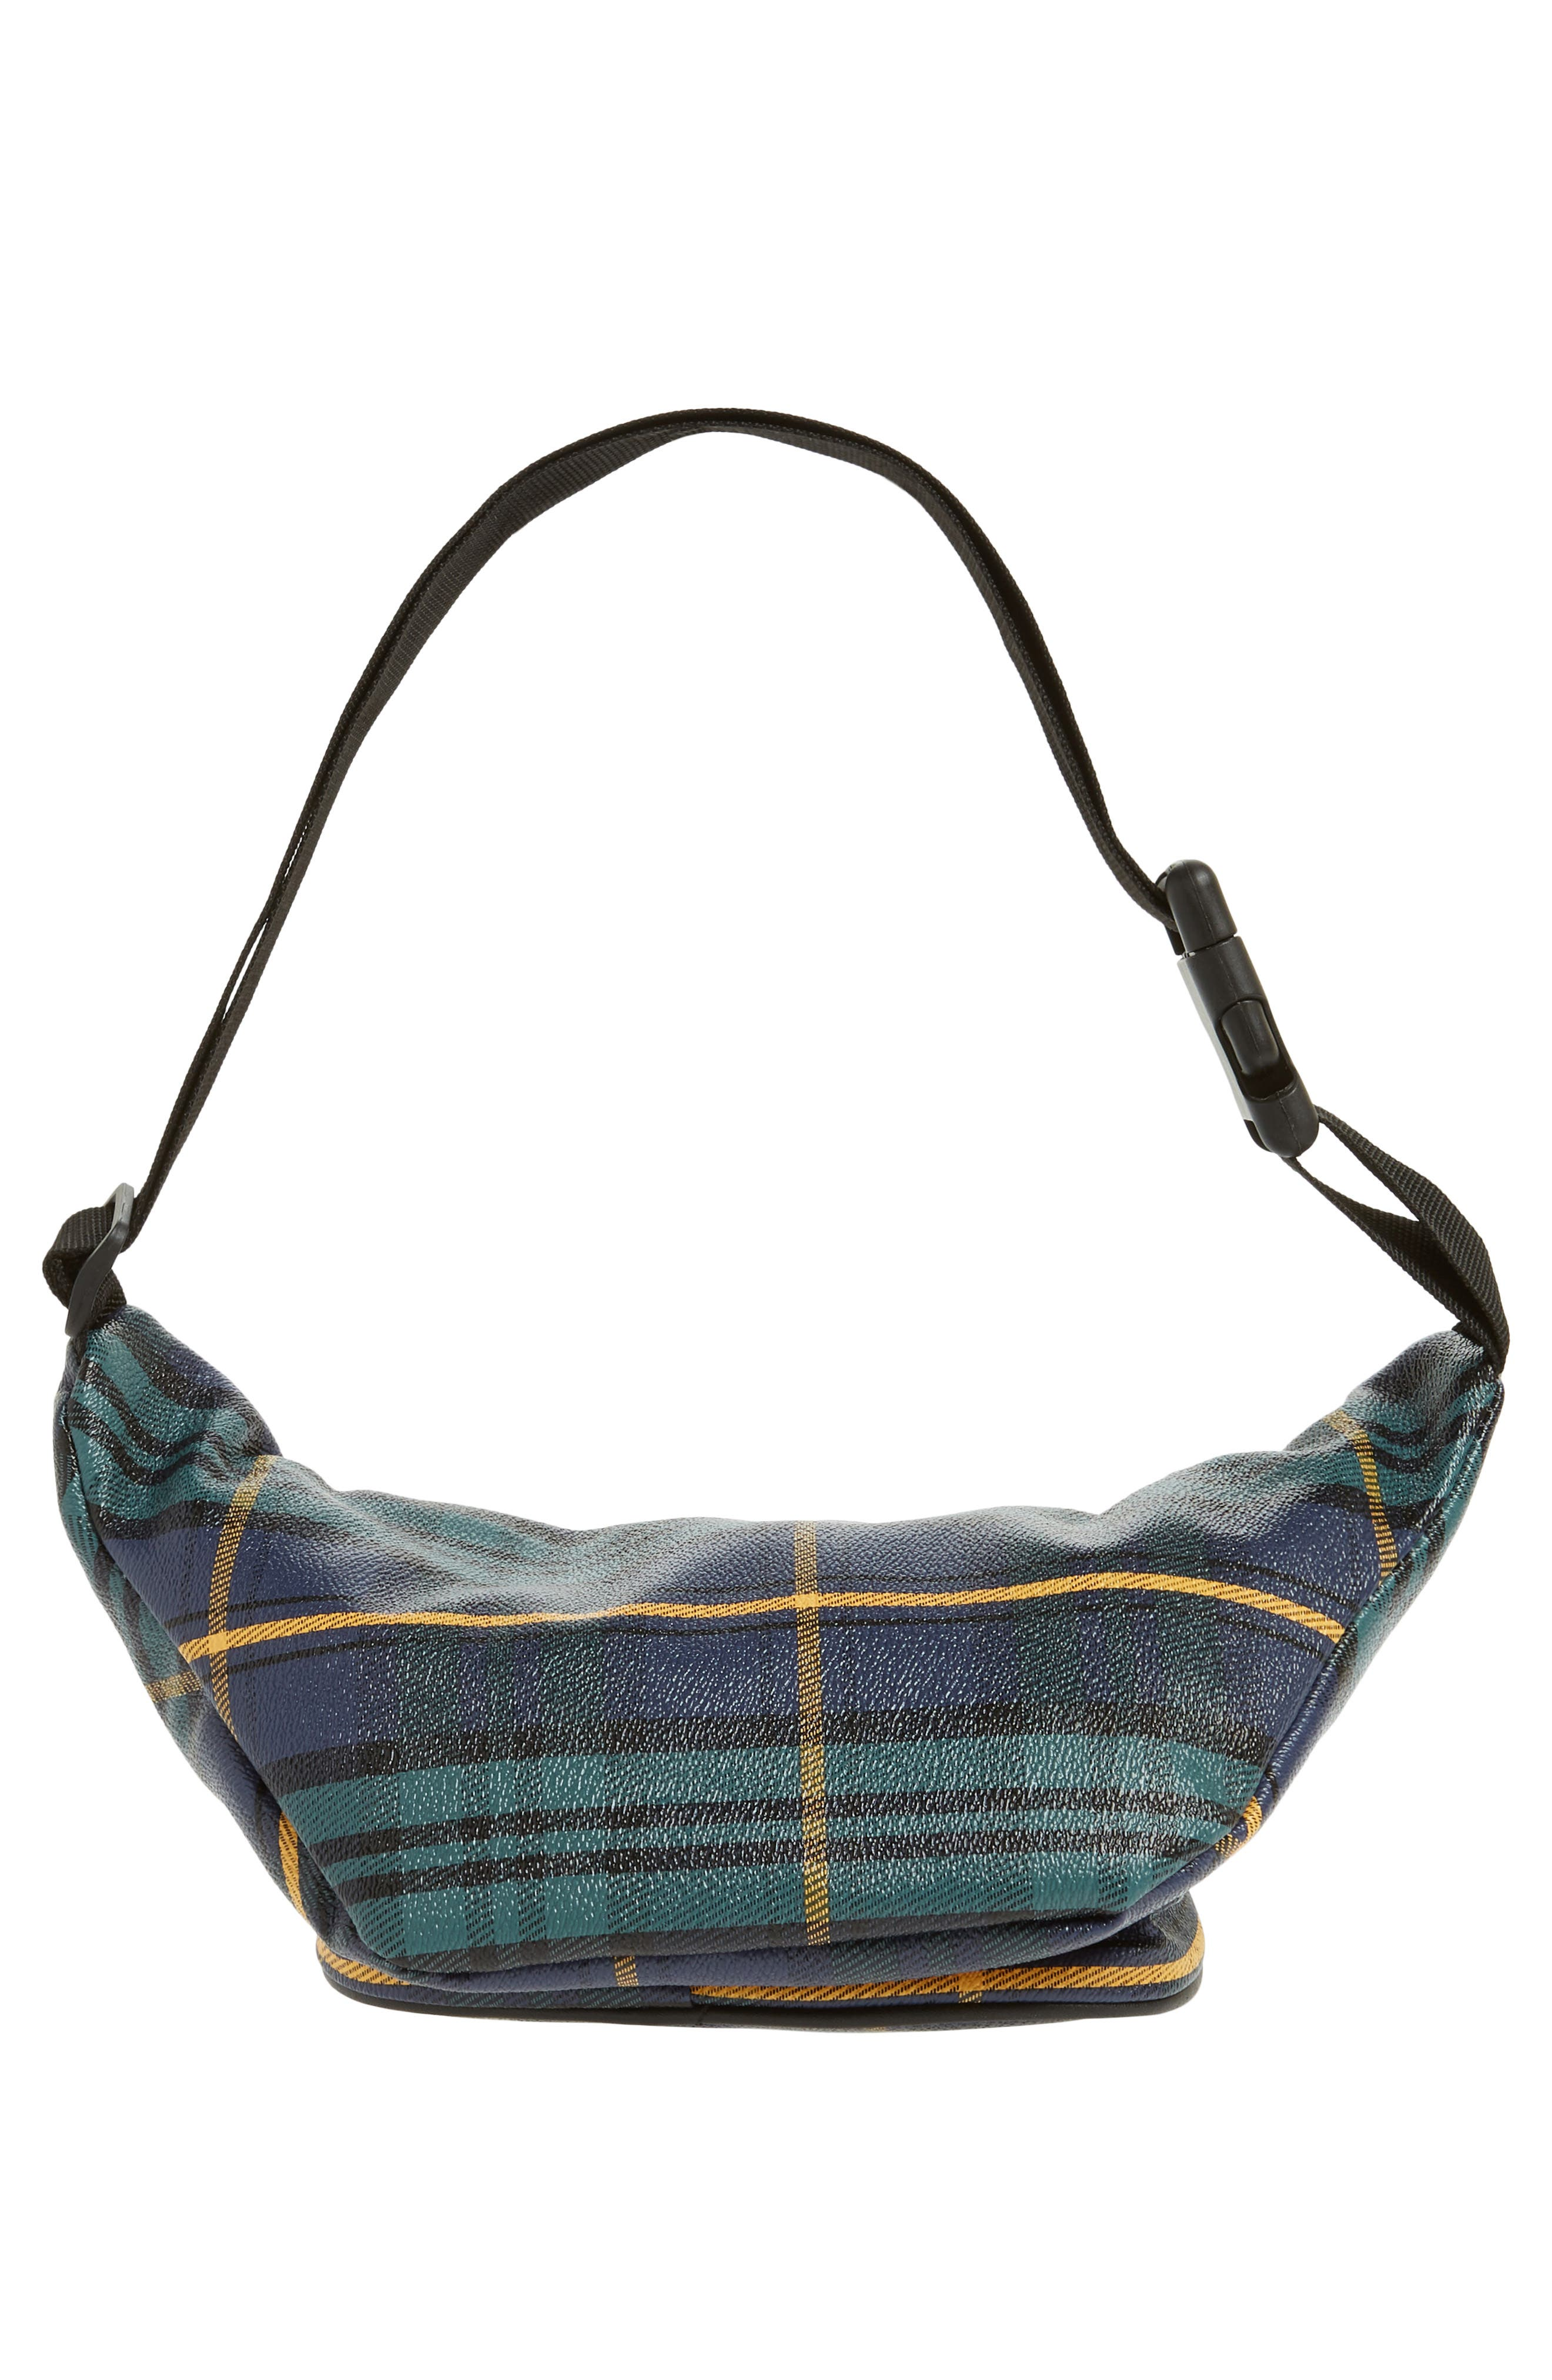 JANE & BERRY, Plaid Belt Bag, Alternate thumbnail 7, color, 300